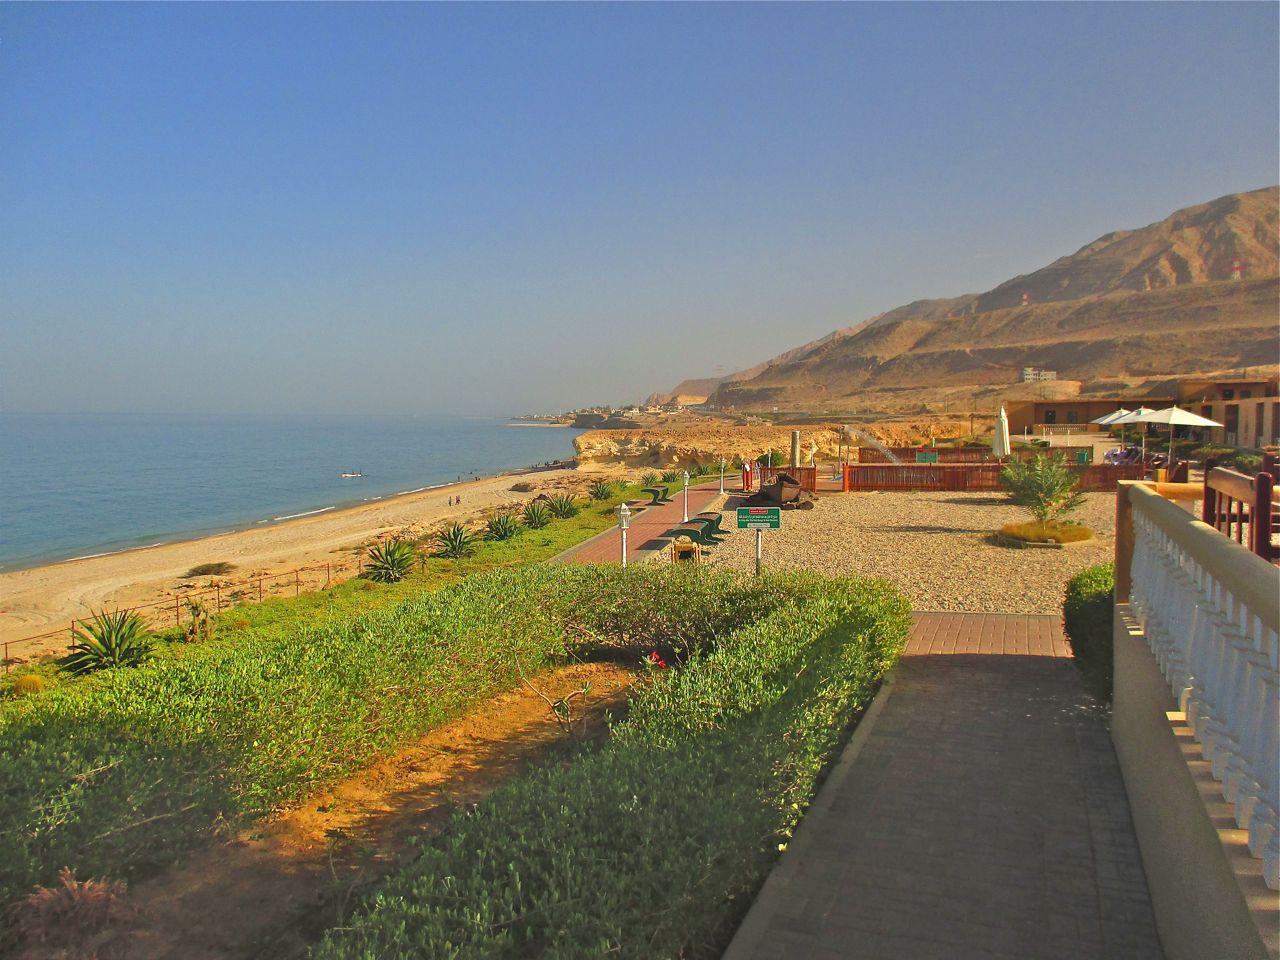 Le Wadi Shab Resort à Oman.